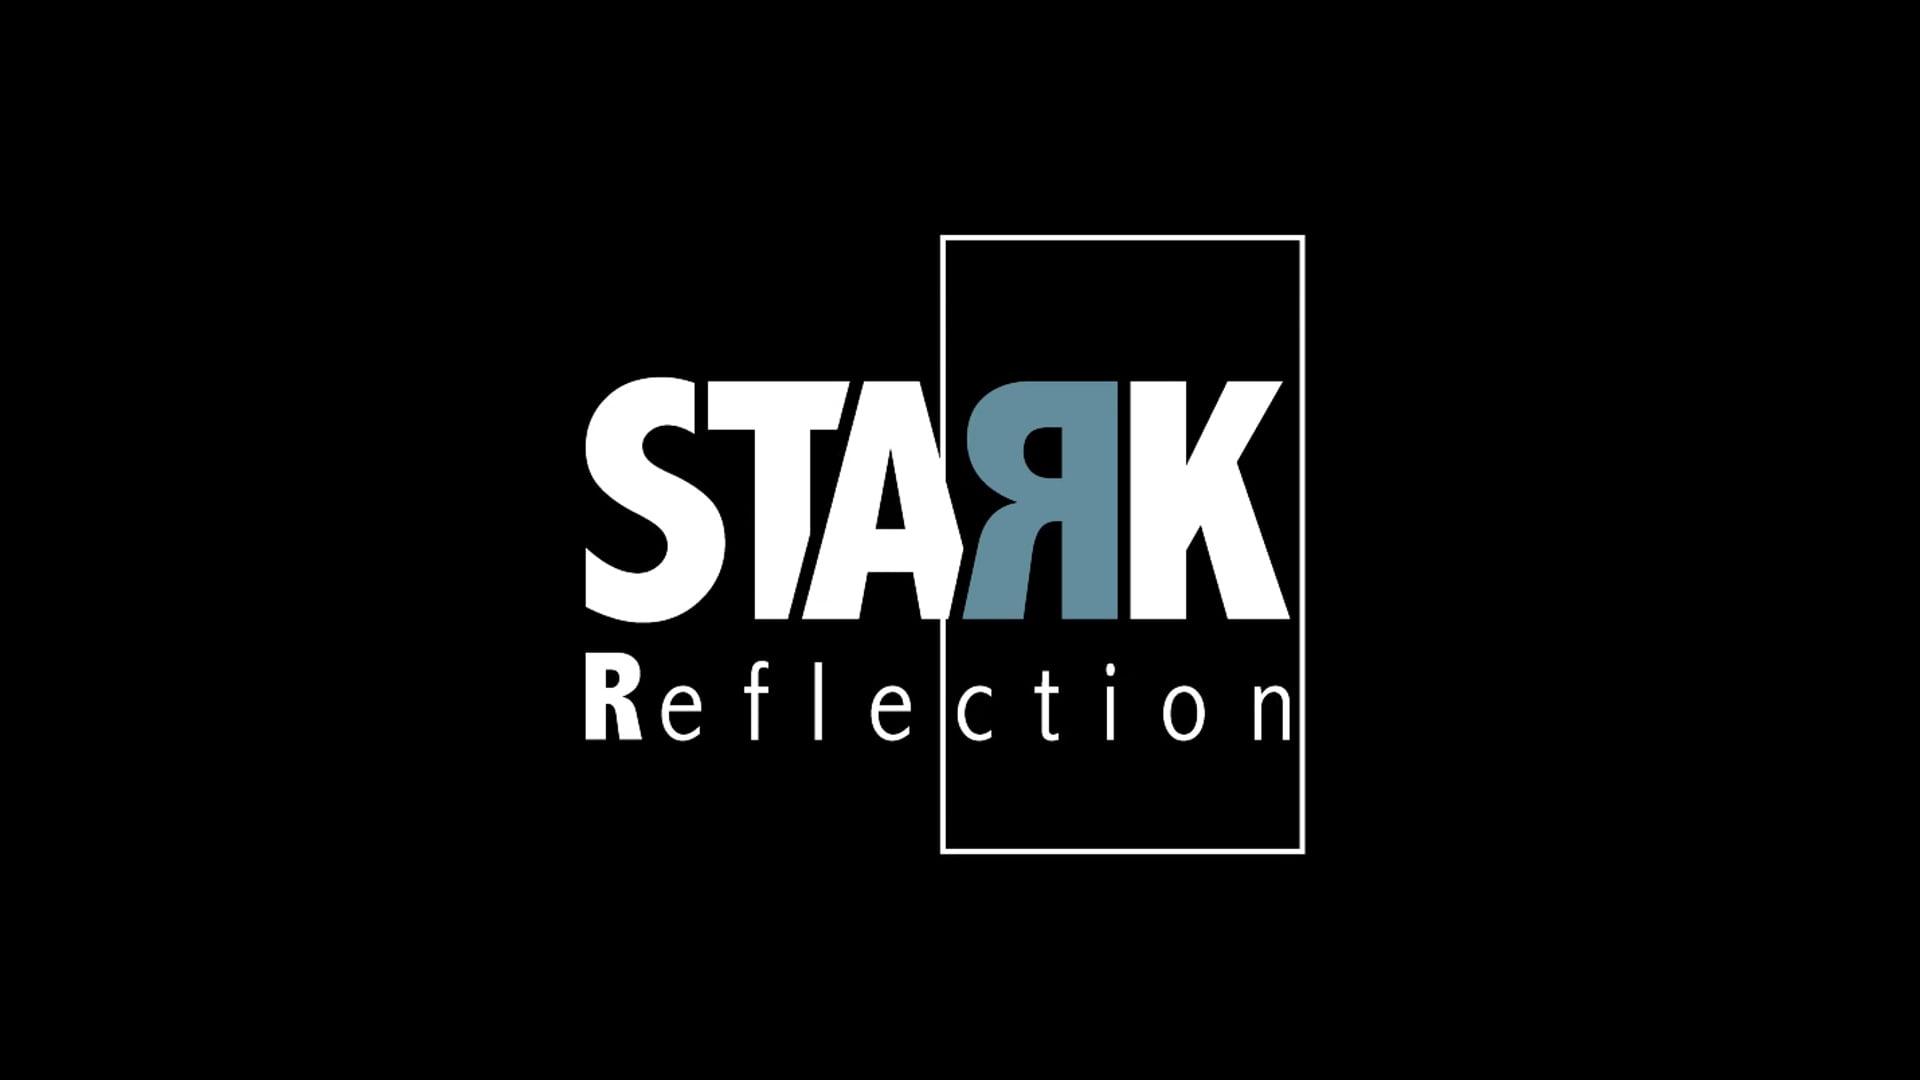 Stark Reflection